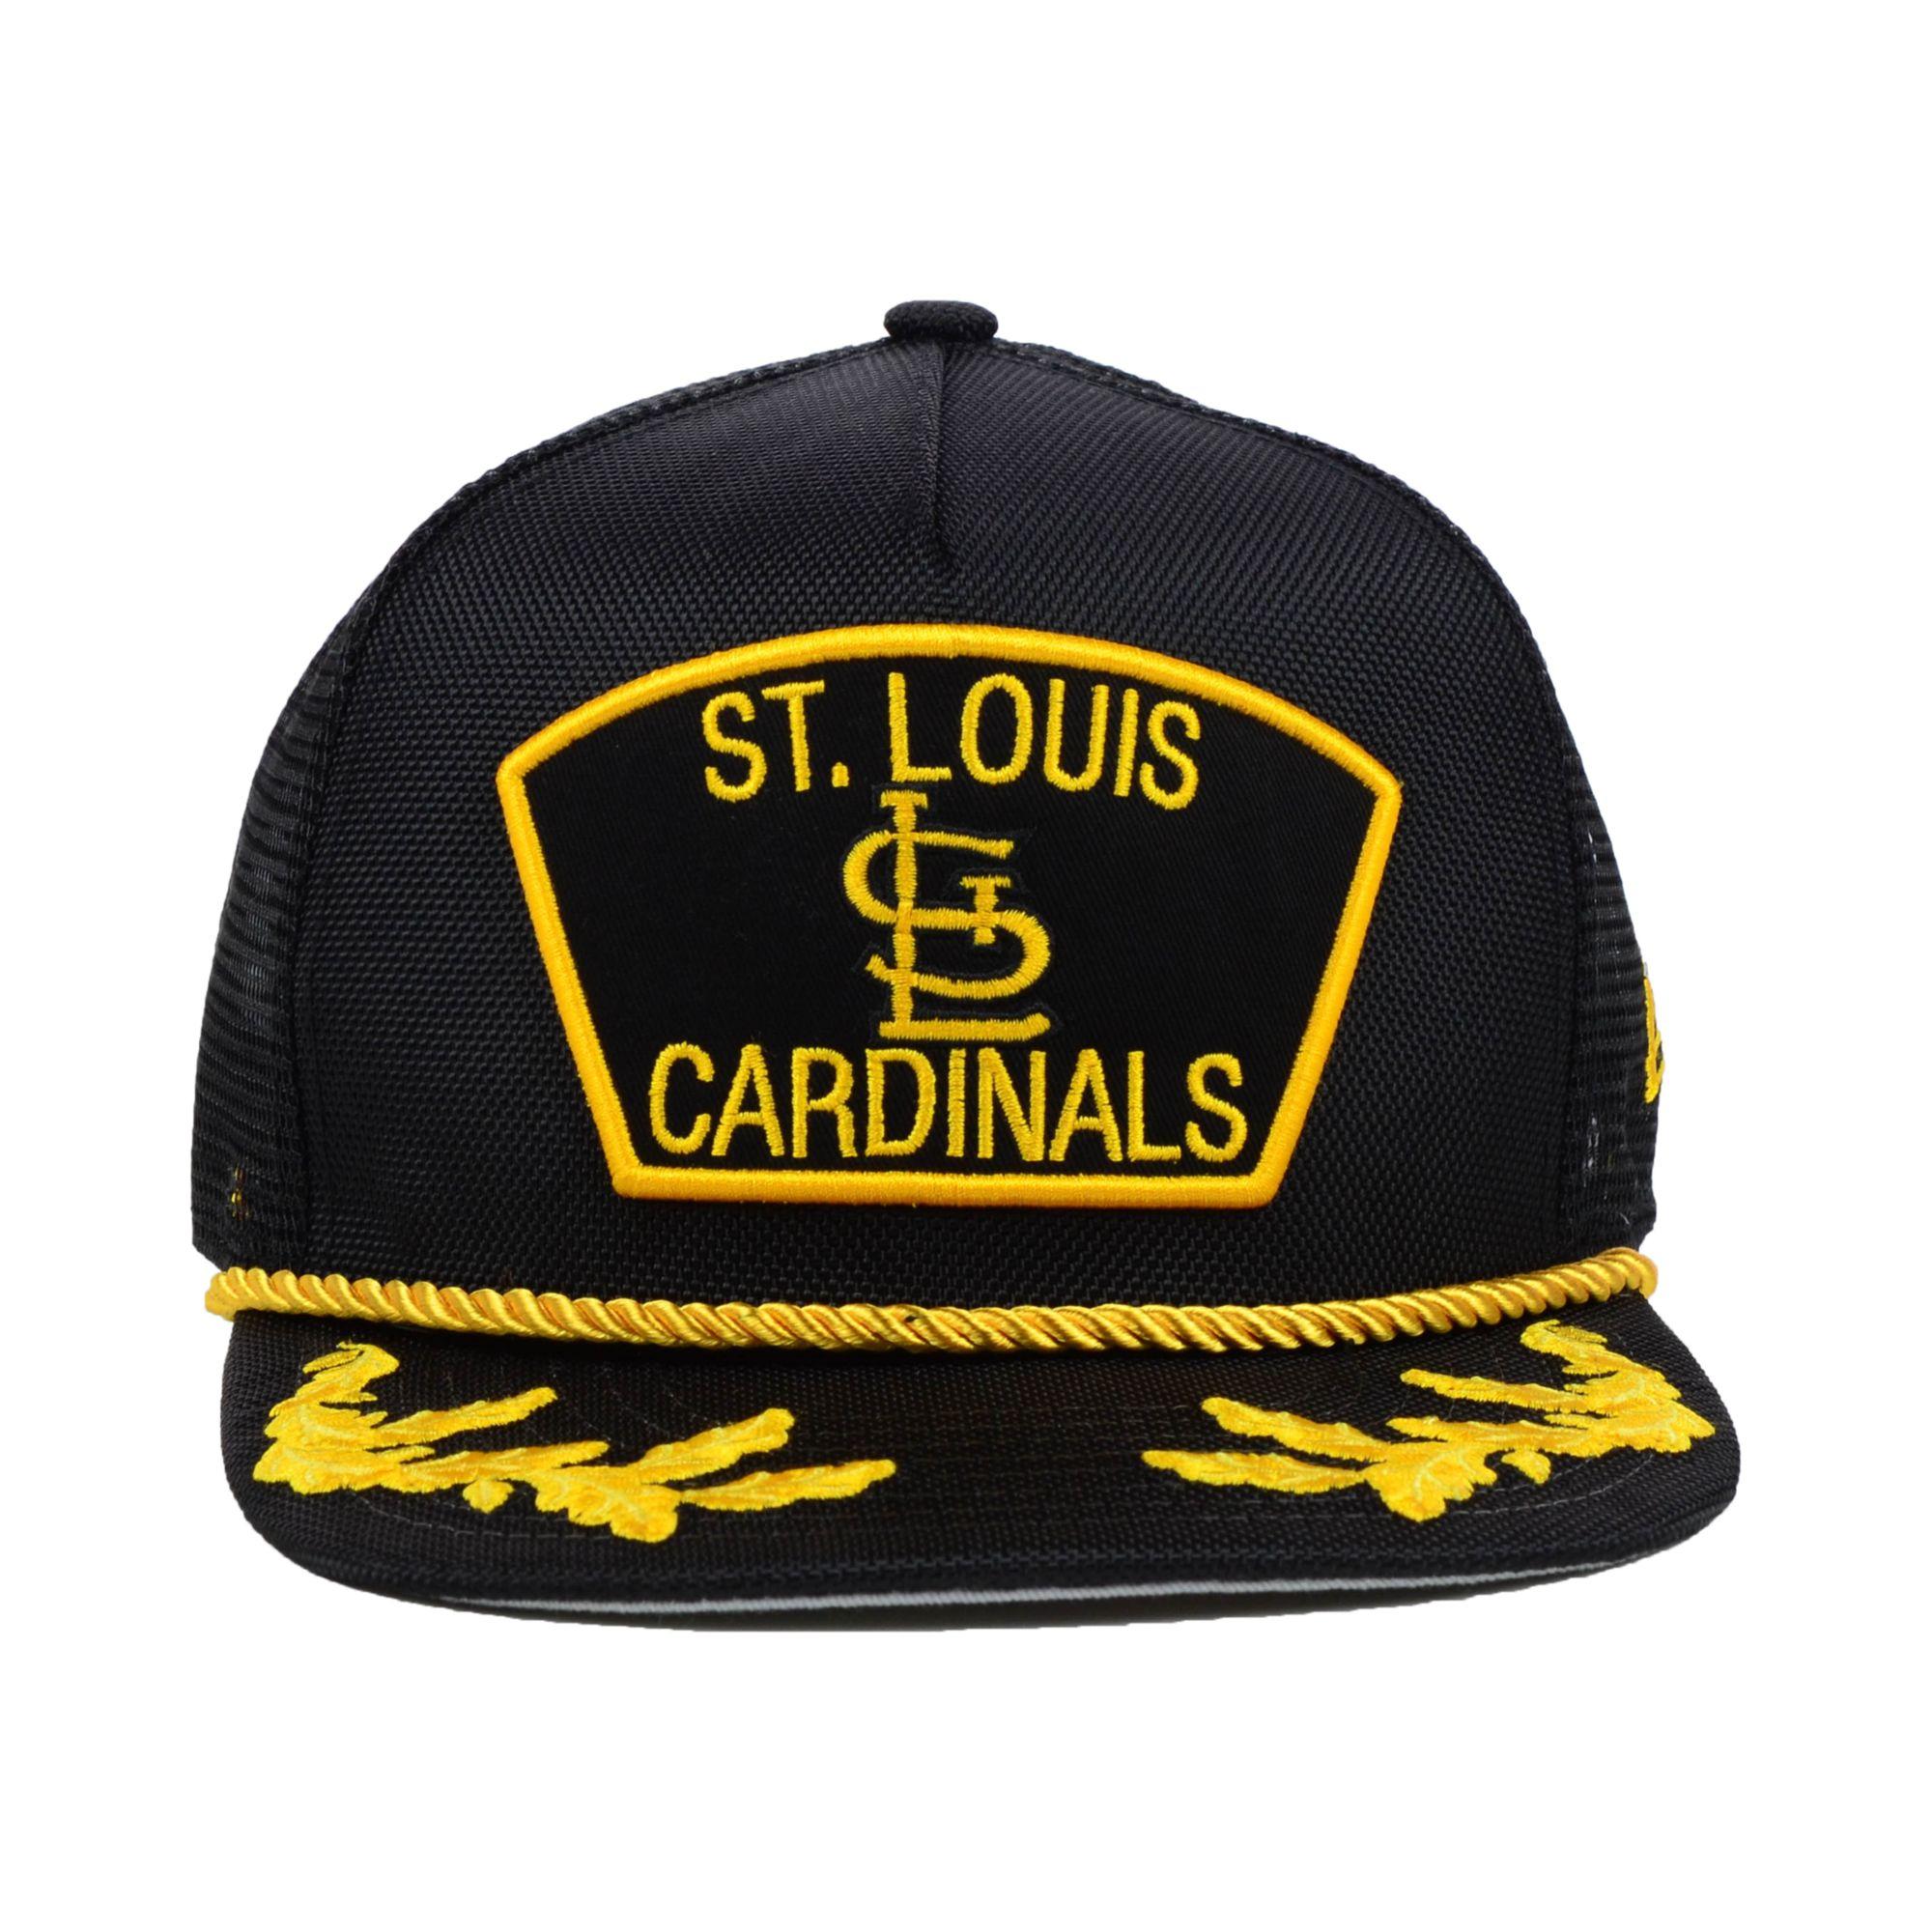 03761566678 ... shopping lyst ktz st louis cardinals mlb 9fifty snapback cap in black  for men c840c 55594